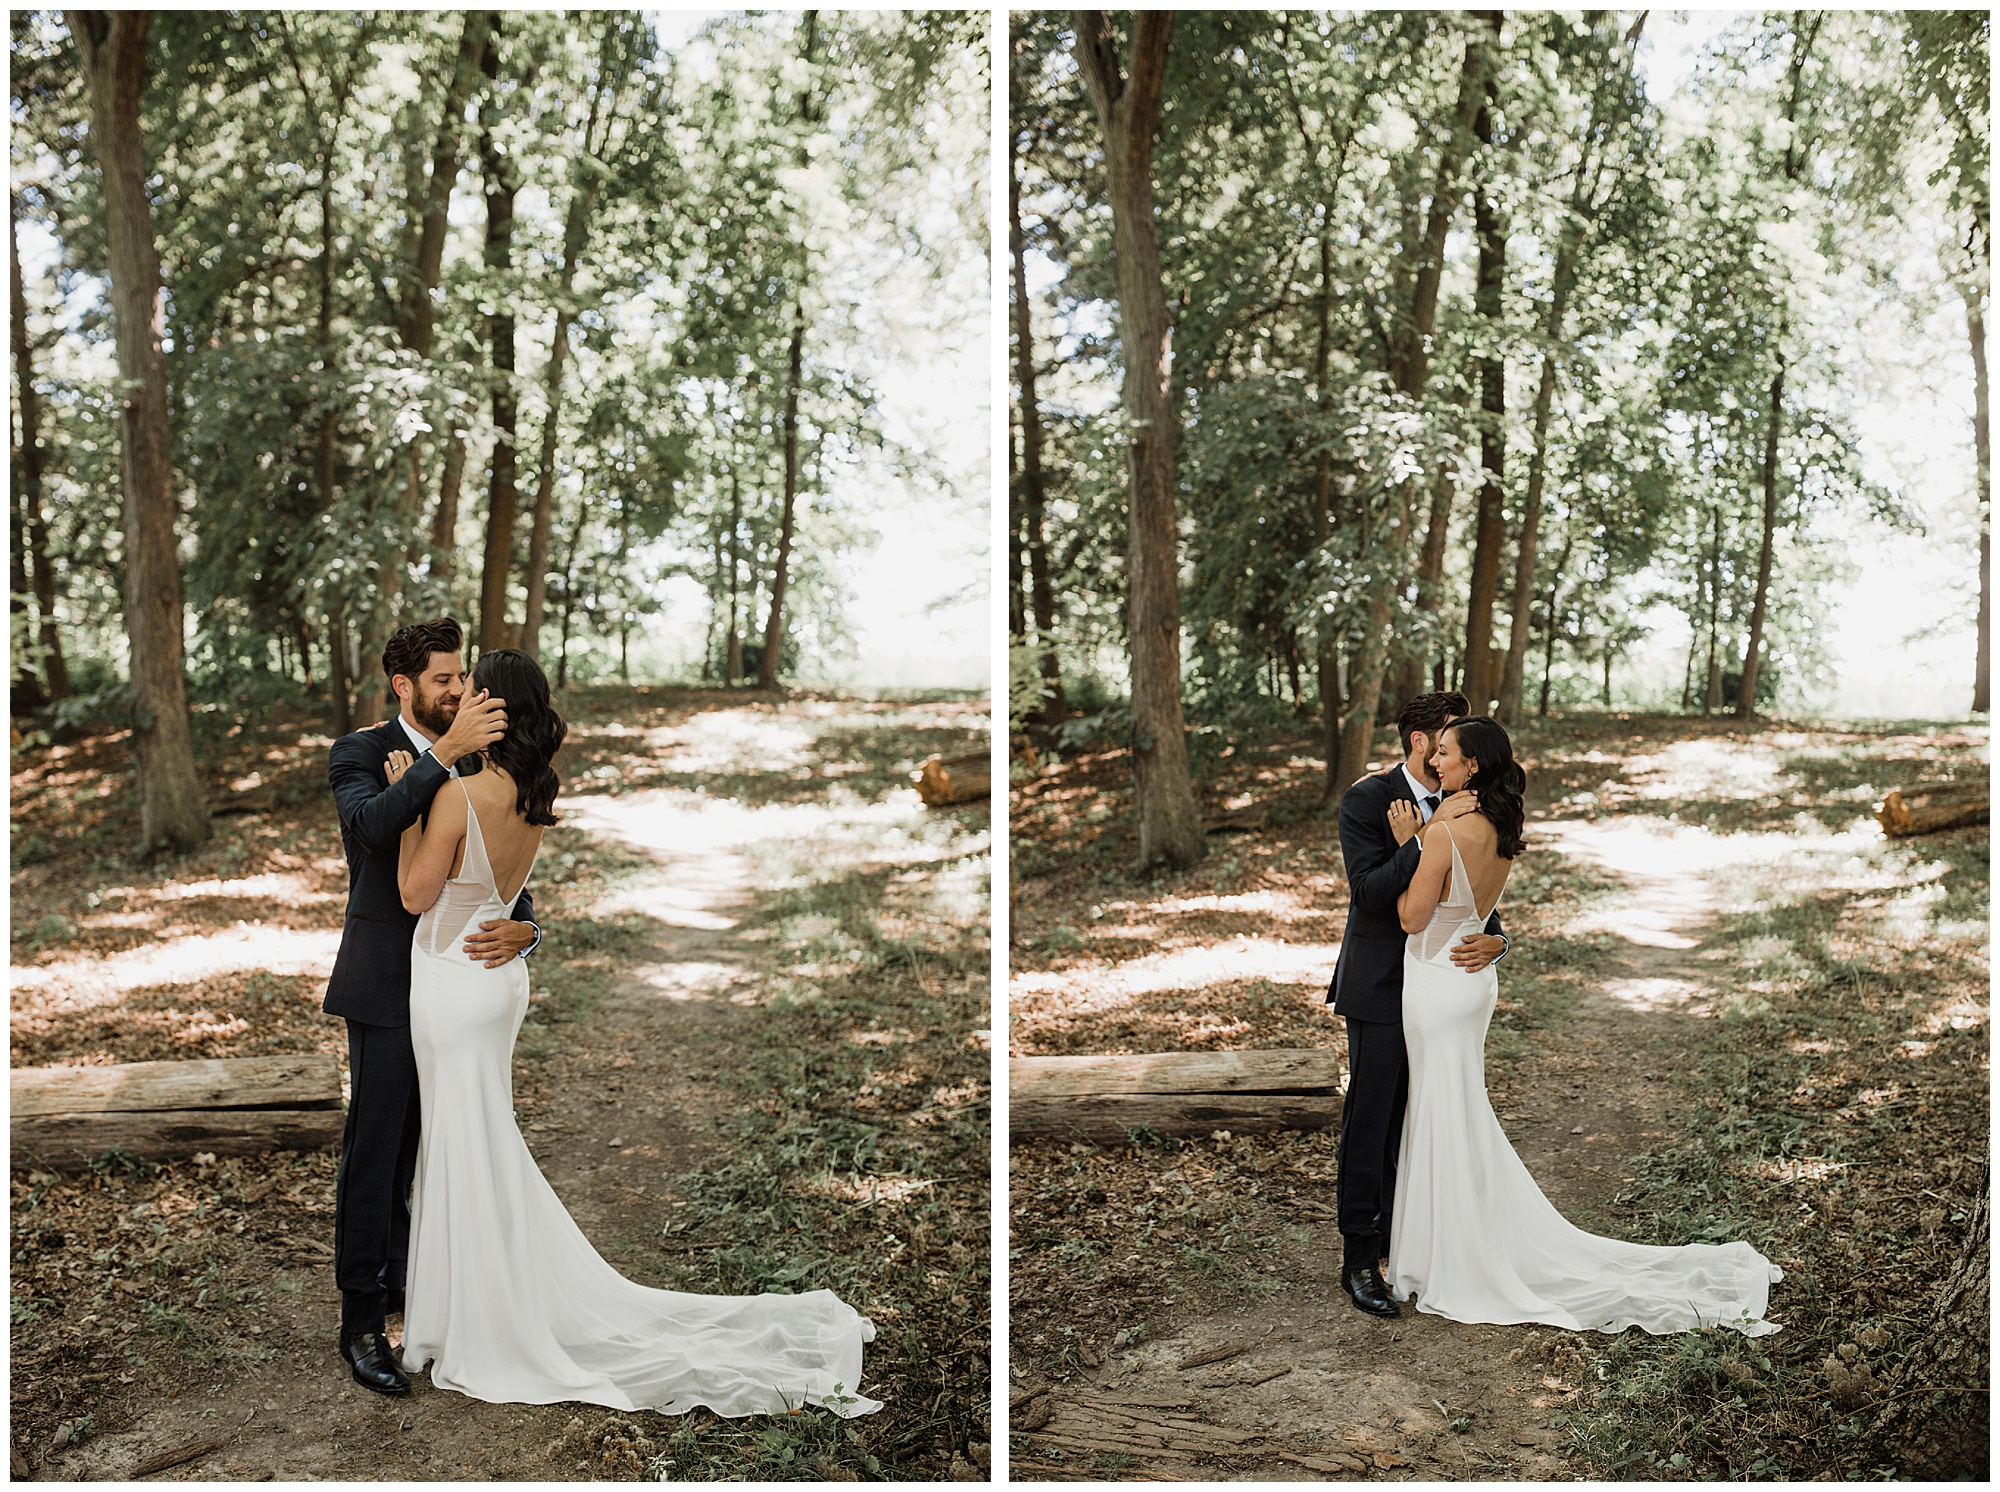 allerton_park_wedding_champaign_il_chicago_wright_photographs_ne_0010.jpg